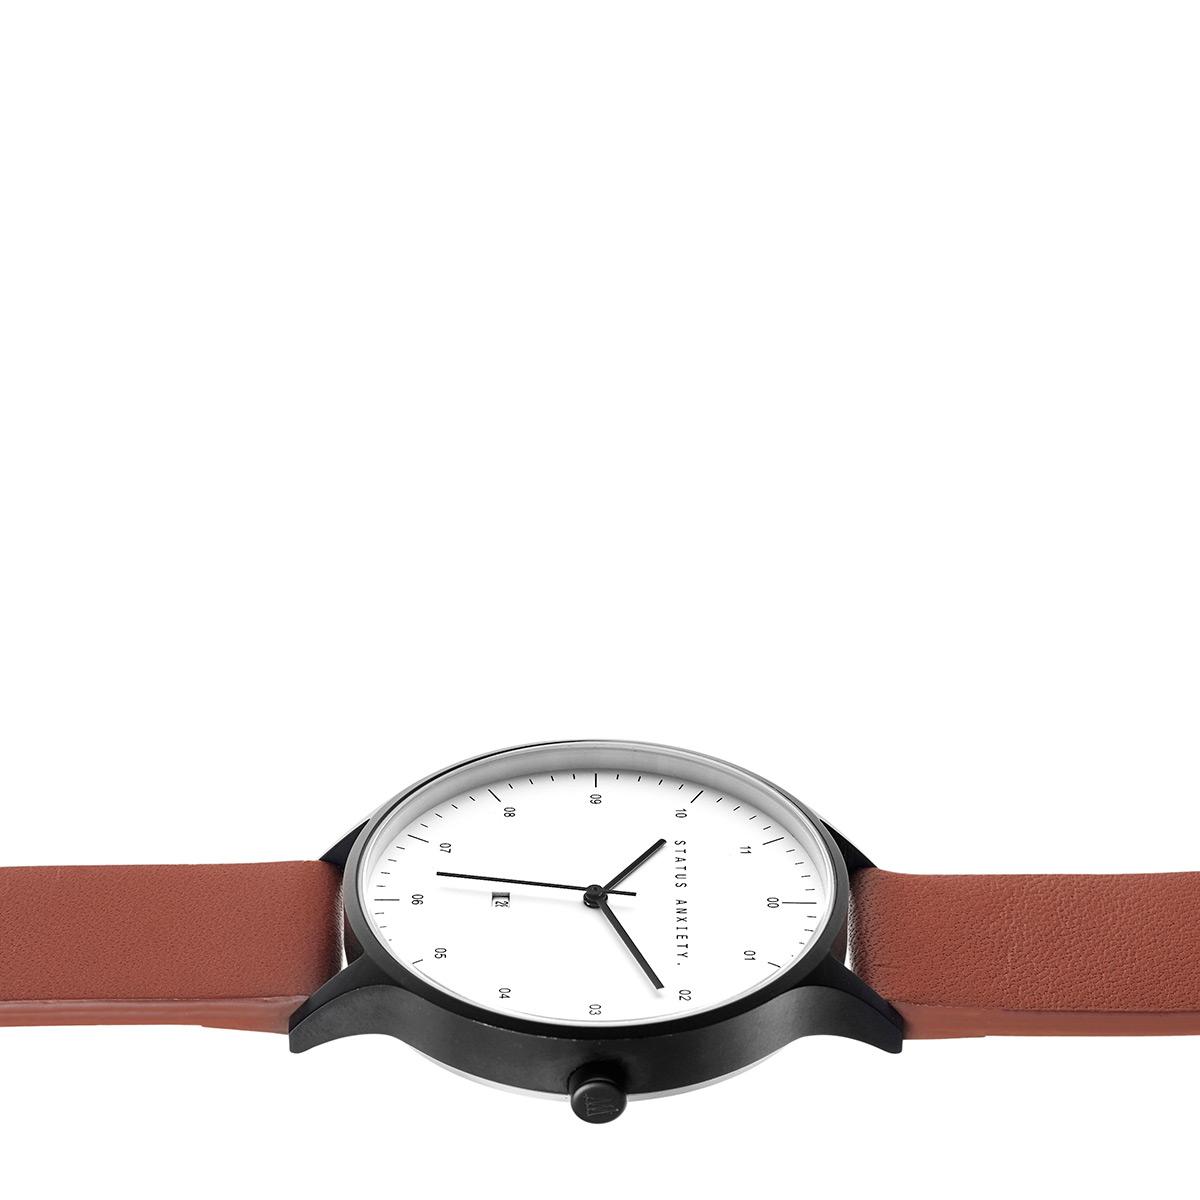 813b1df9c Status Anxiety Inertia Watch- Matte Black/White Face/Tan Strap ...